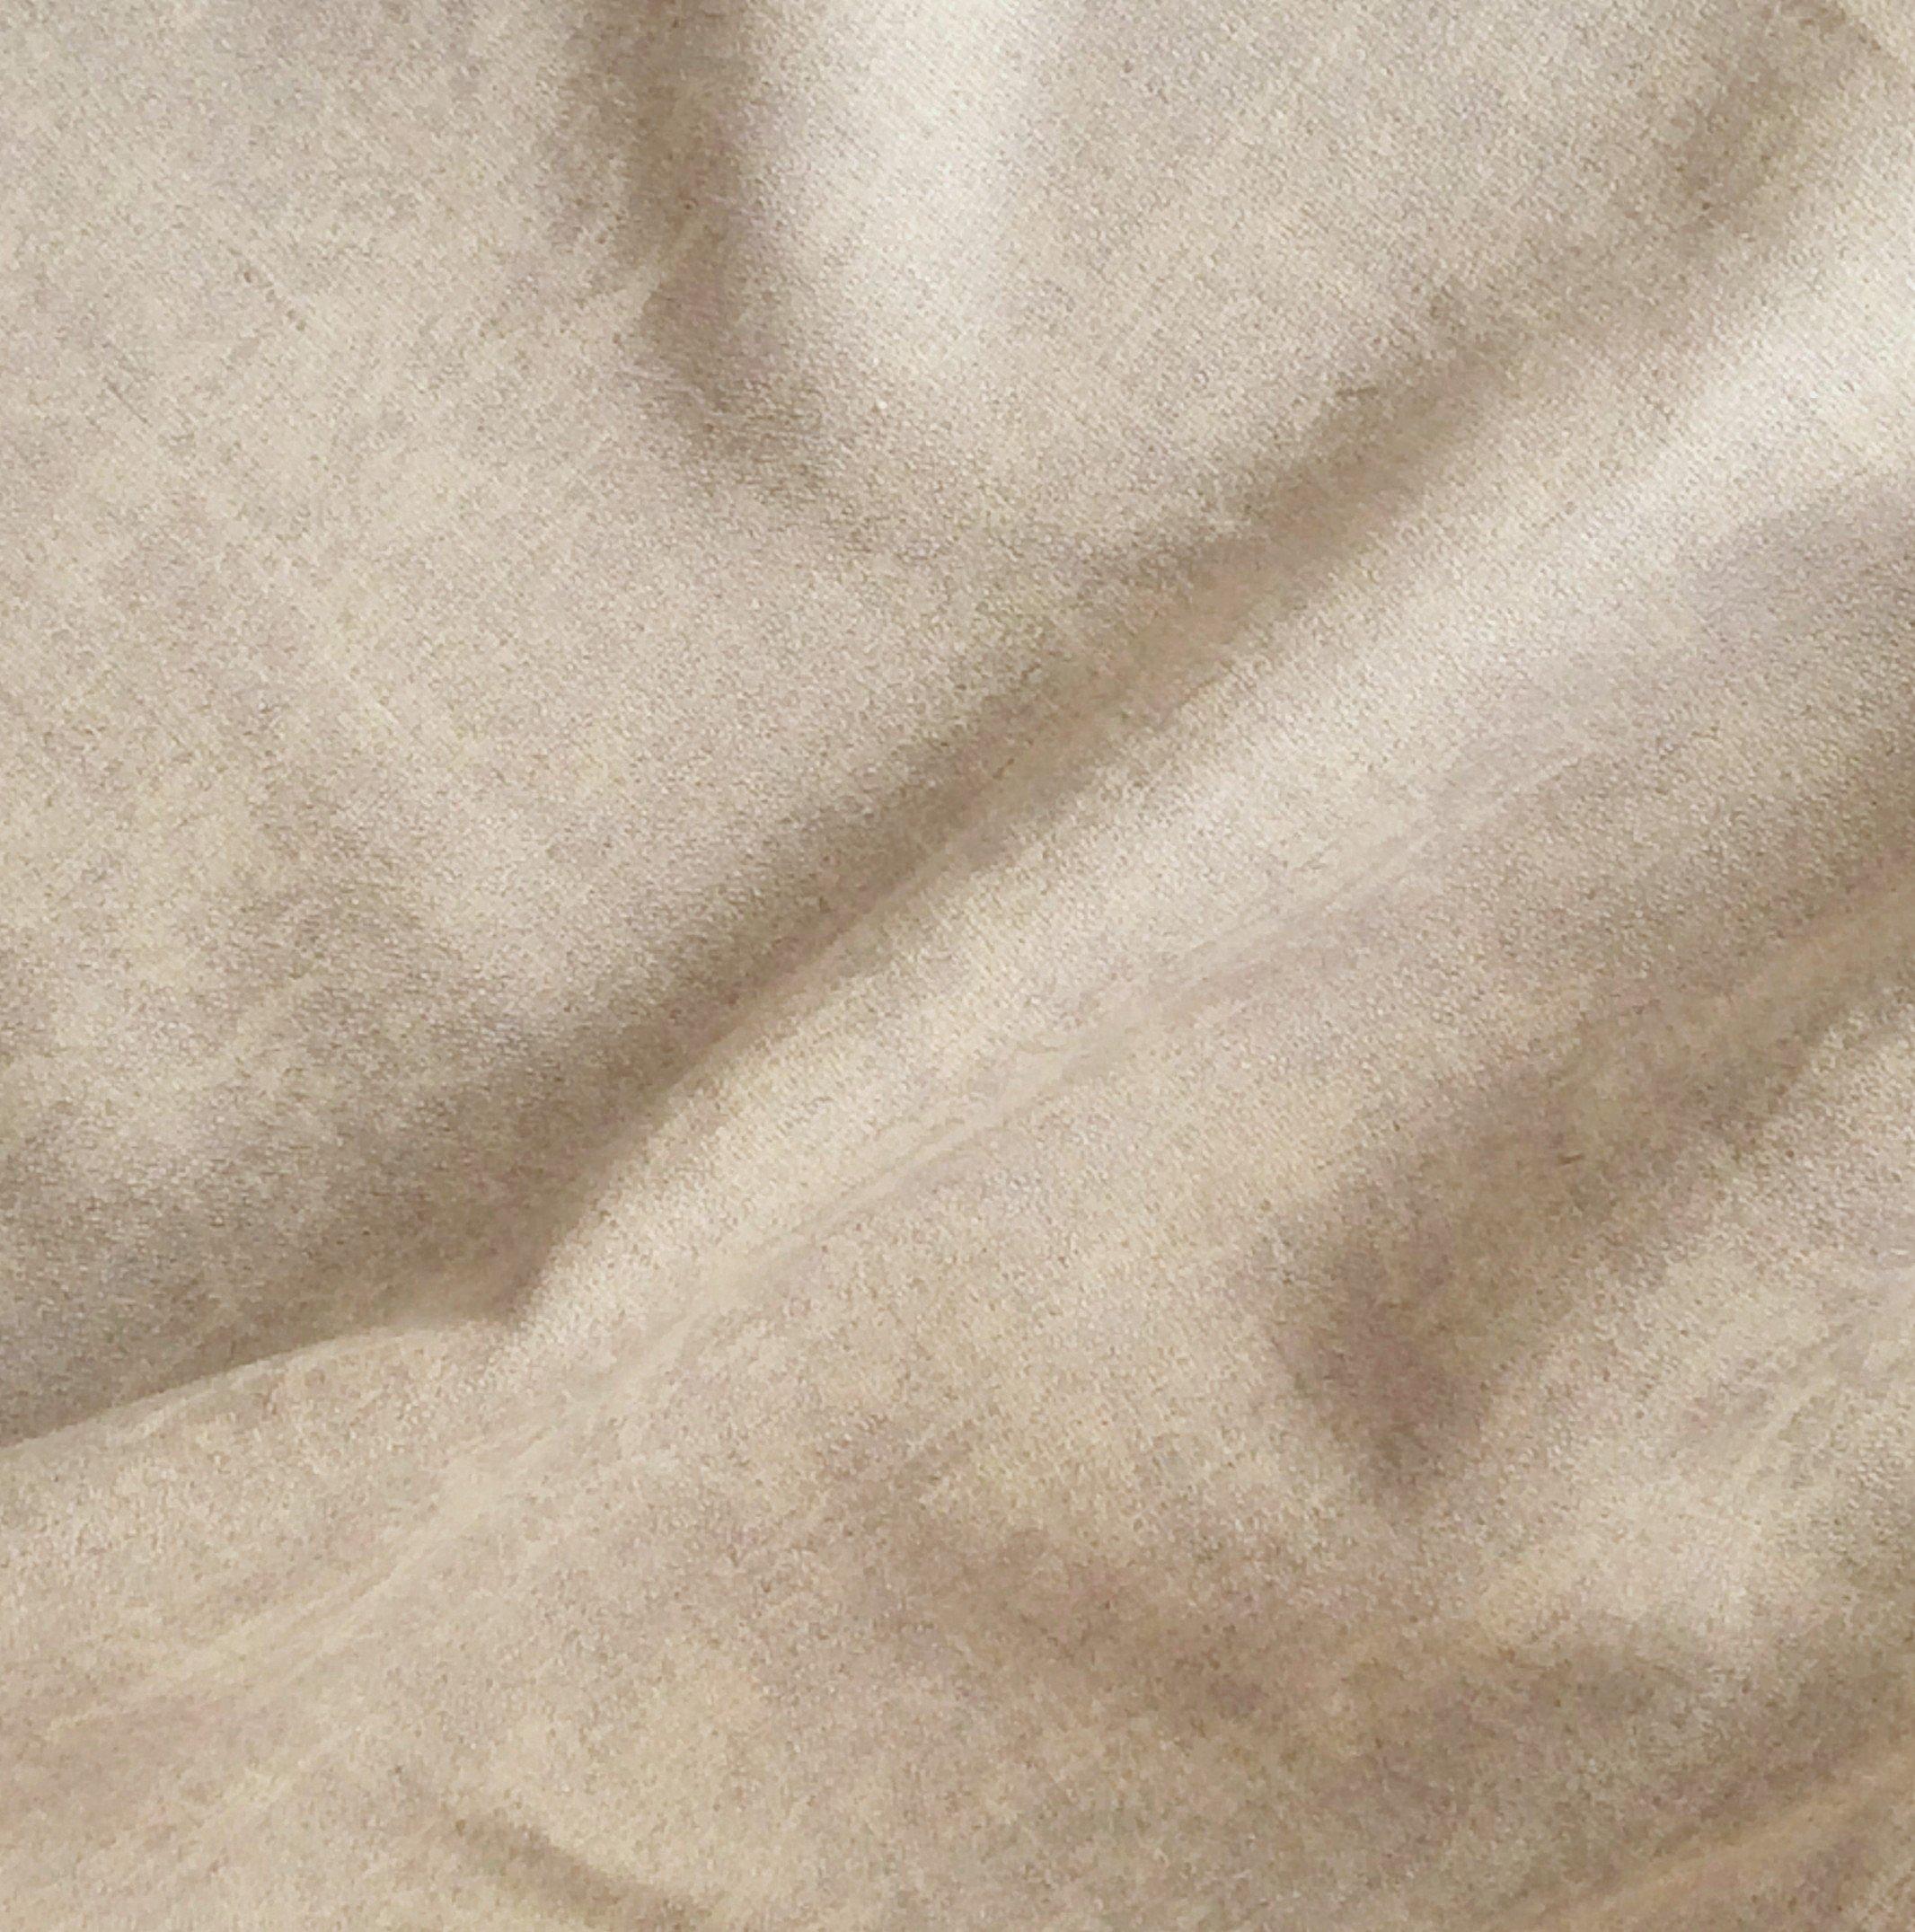 tissu lin beige avec relief